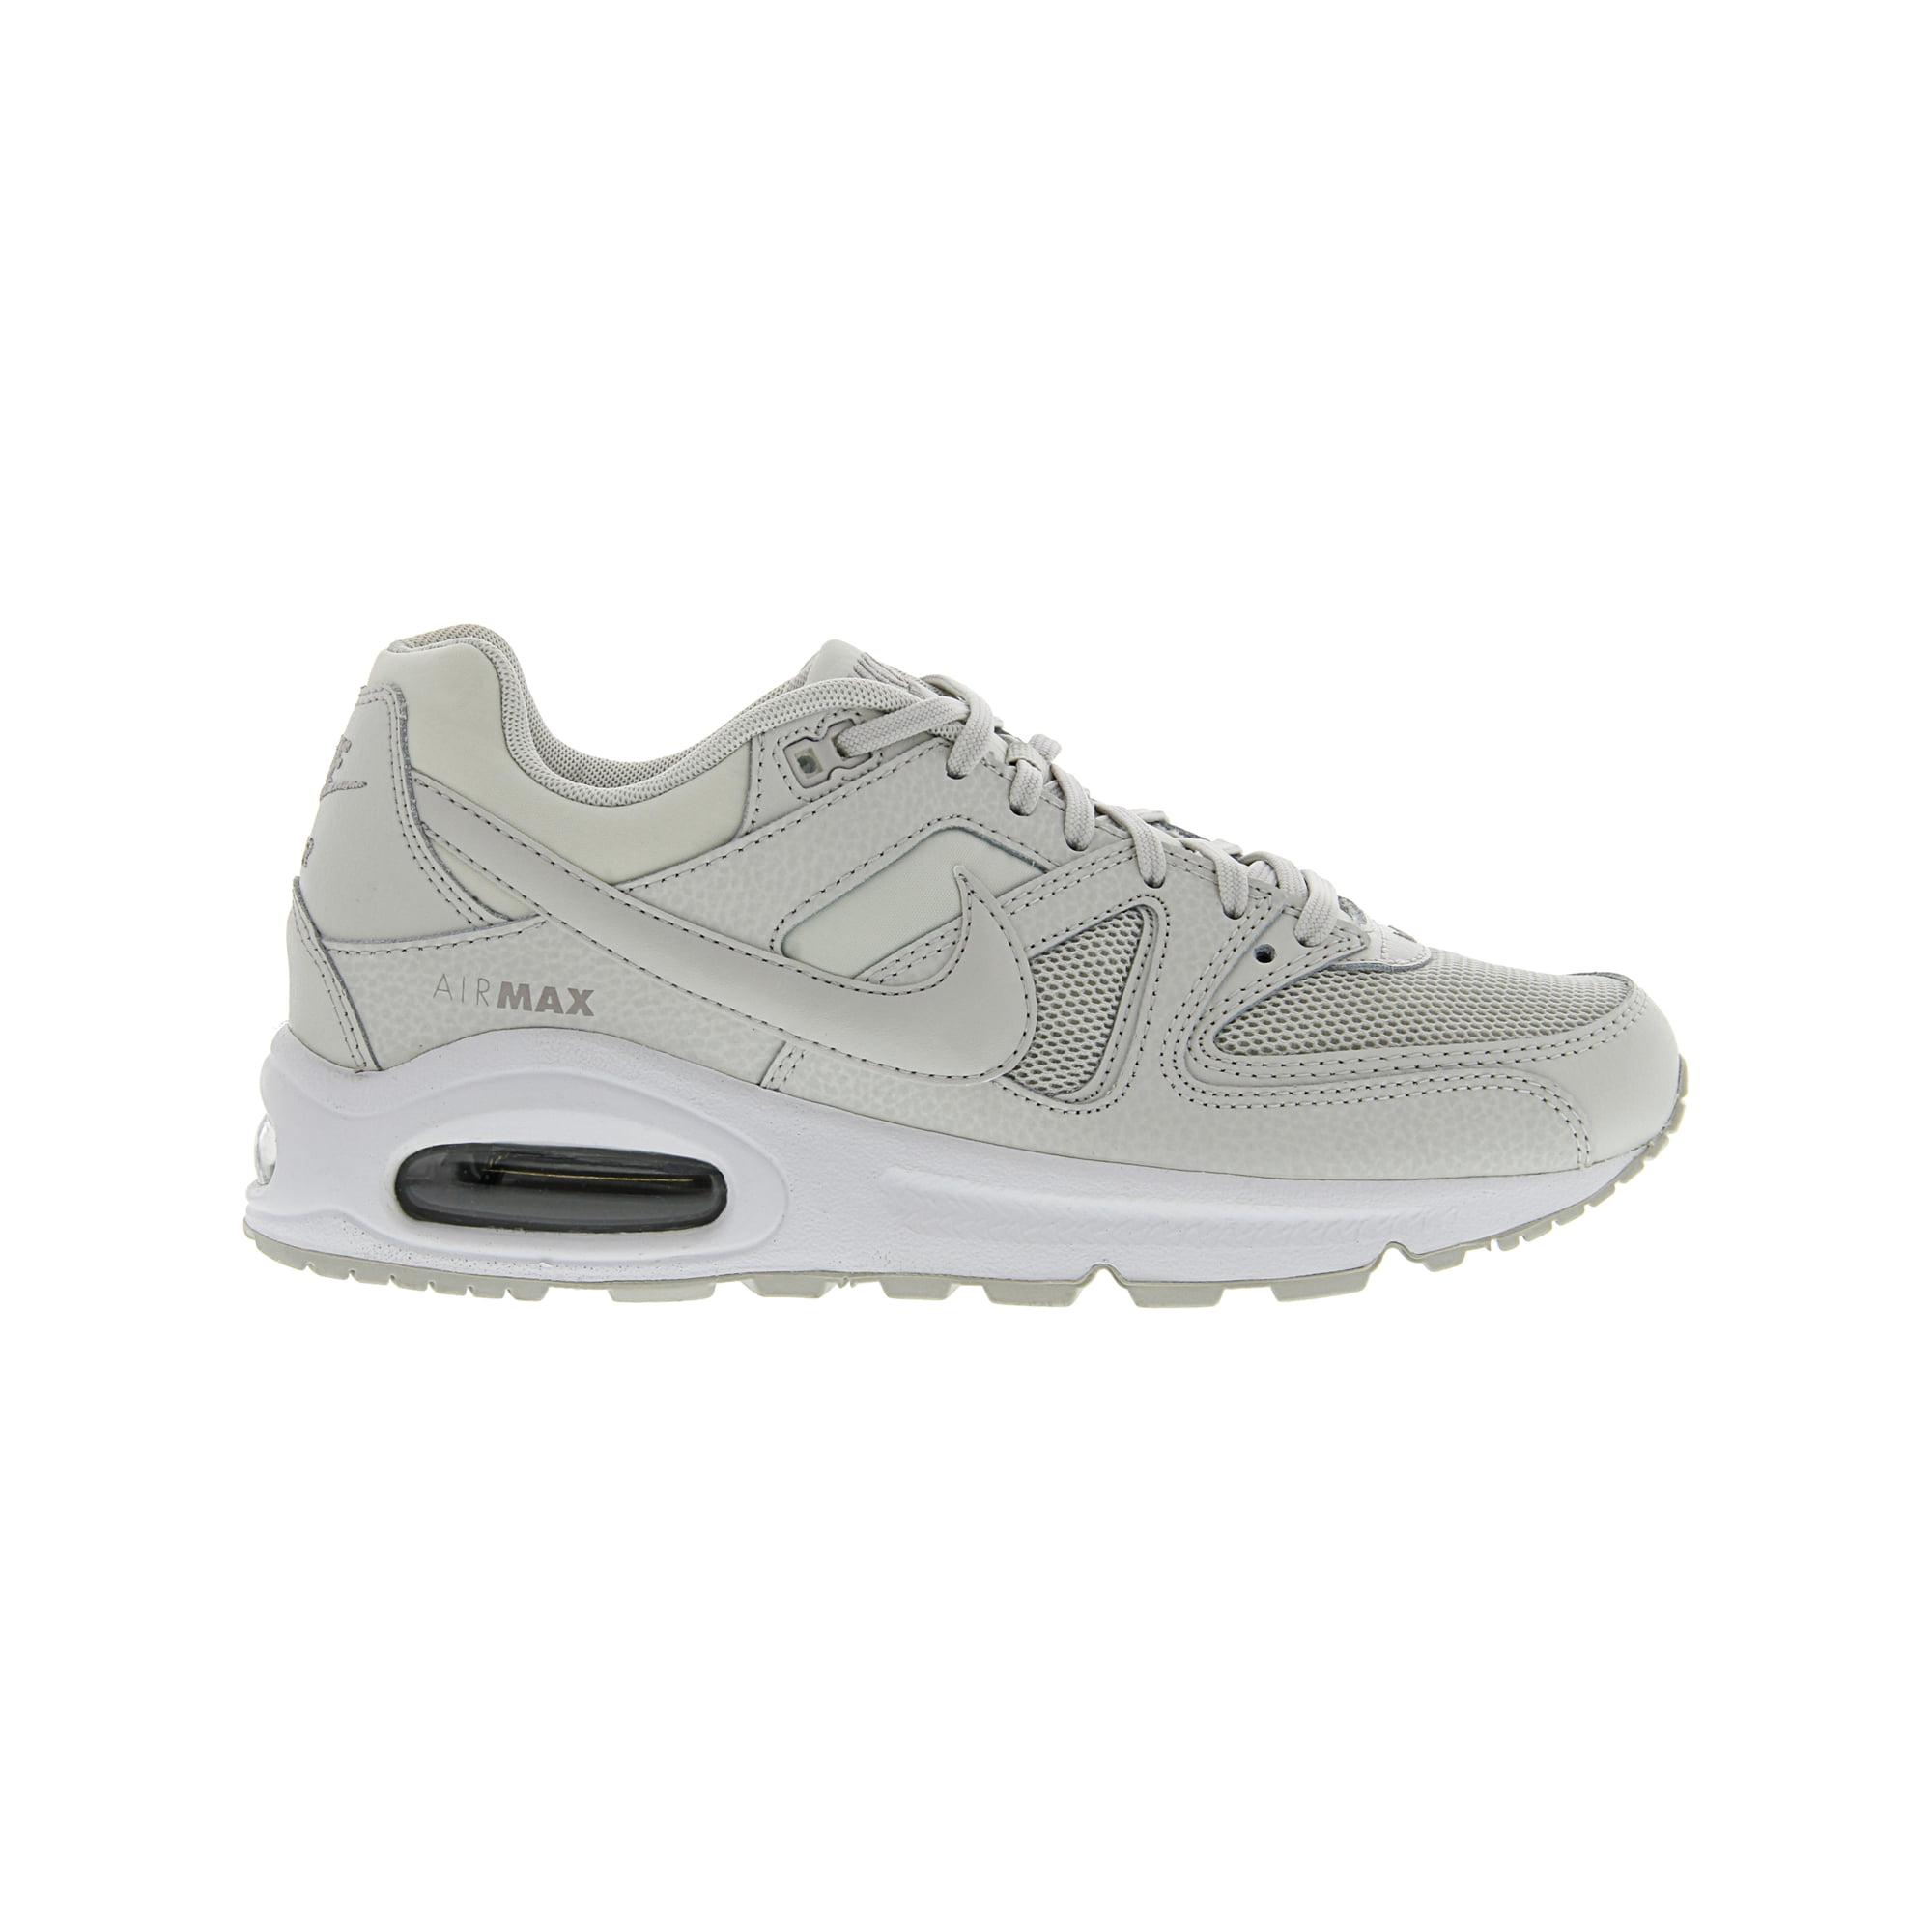 Nike Women's Air Max Command Light Bone White Ankle High